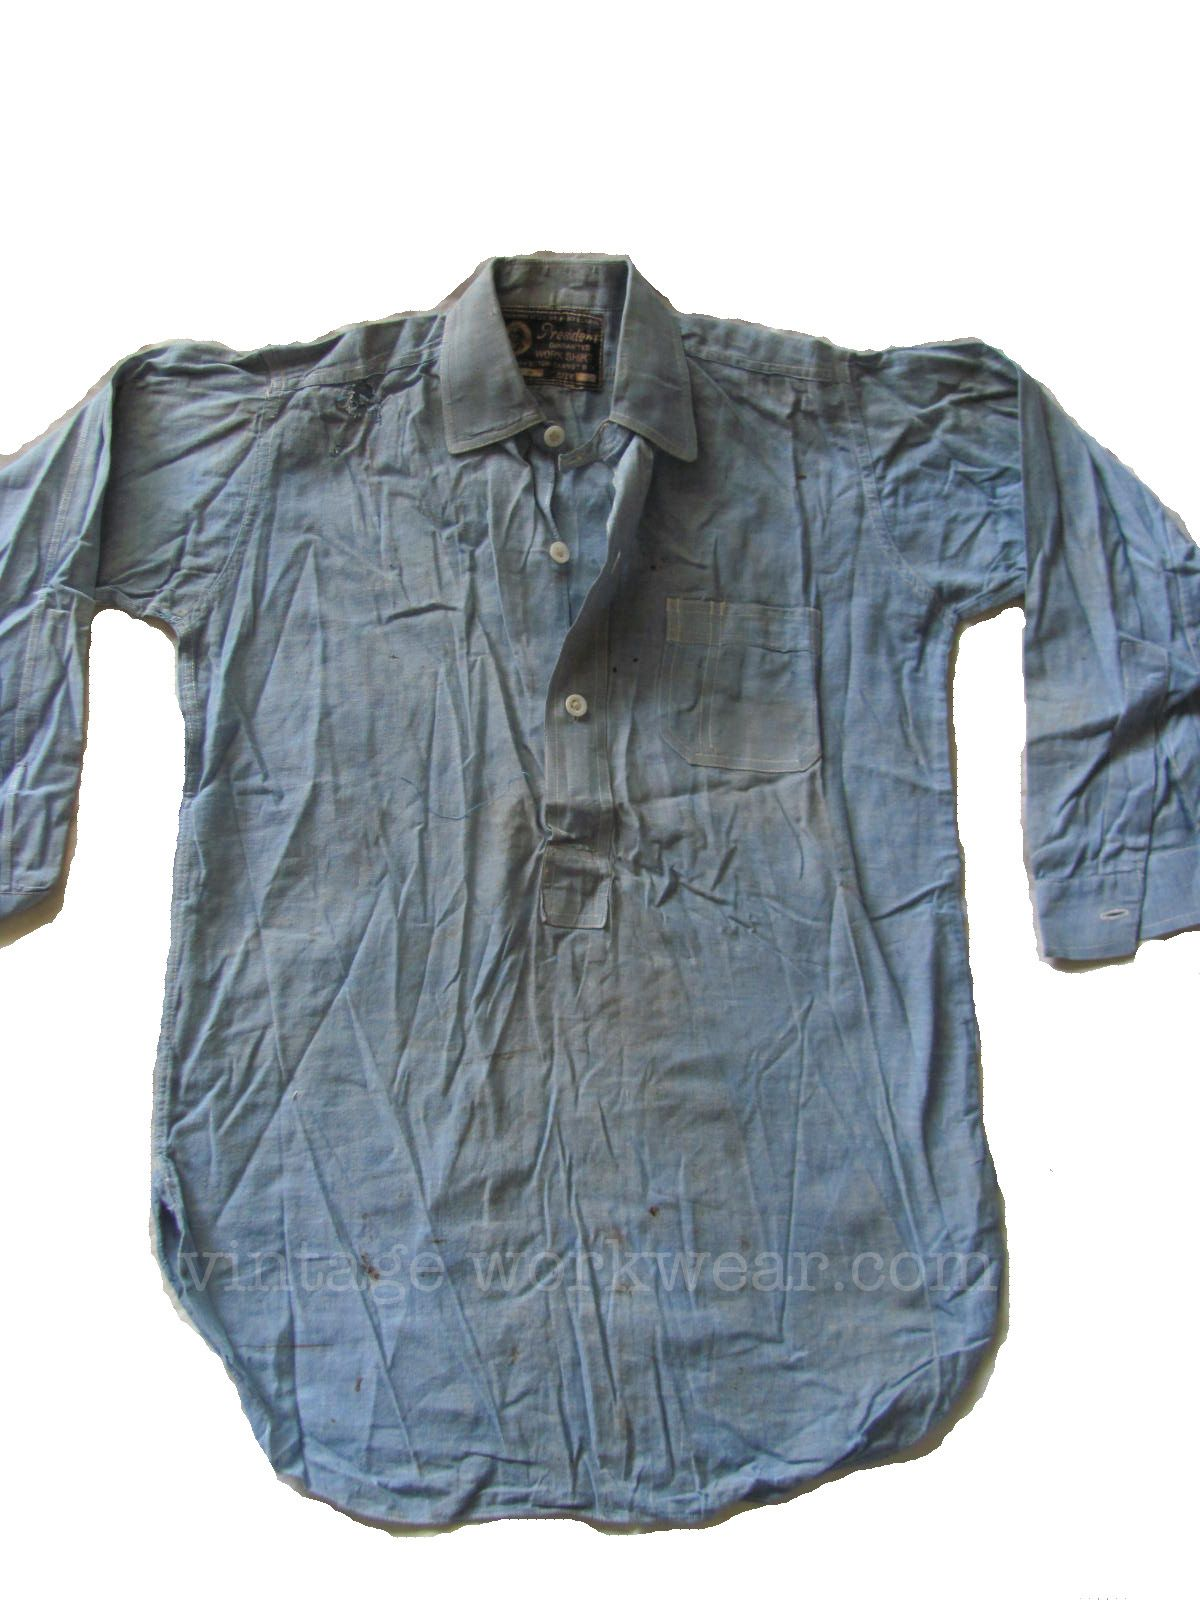 Vintage Workwear Vintage Denim Jacket Workwear Vintage Work Shirts